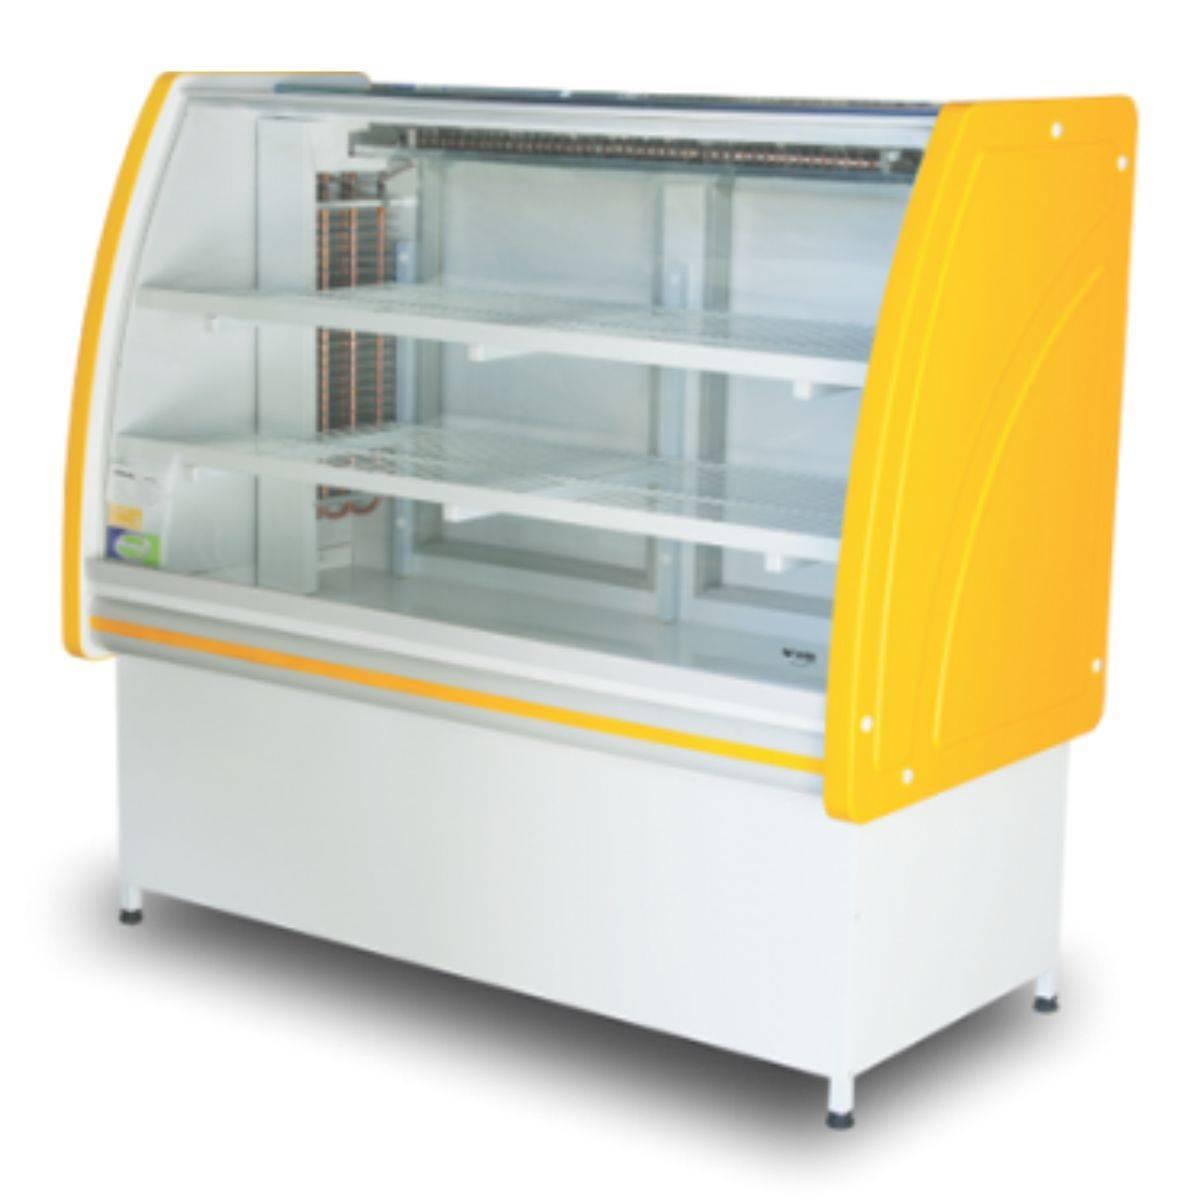 Vitrine Refrigerada 1,25m Premium Refrigel - Magazine do Chef